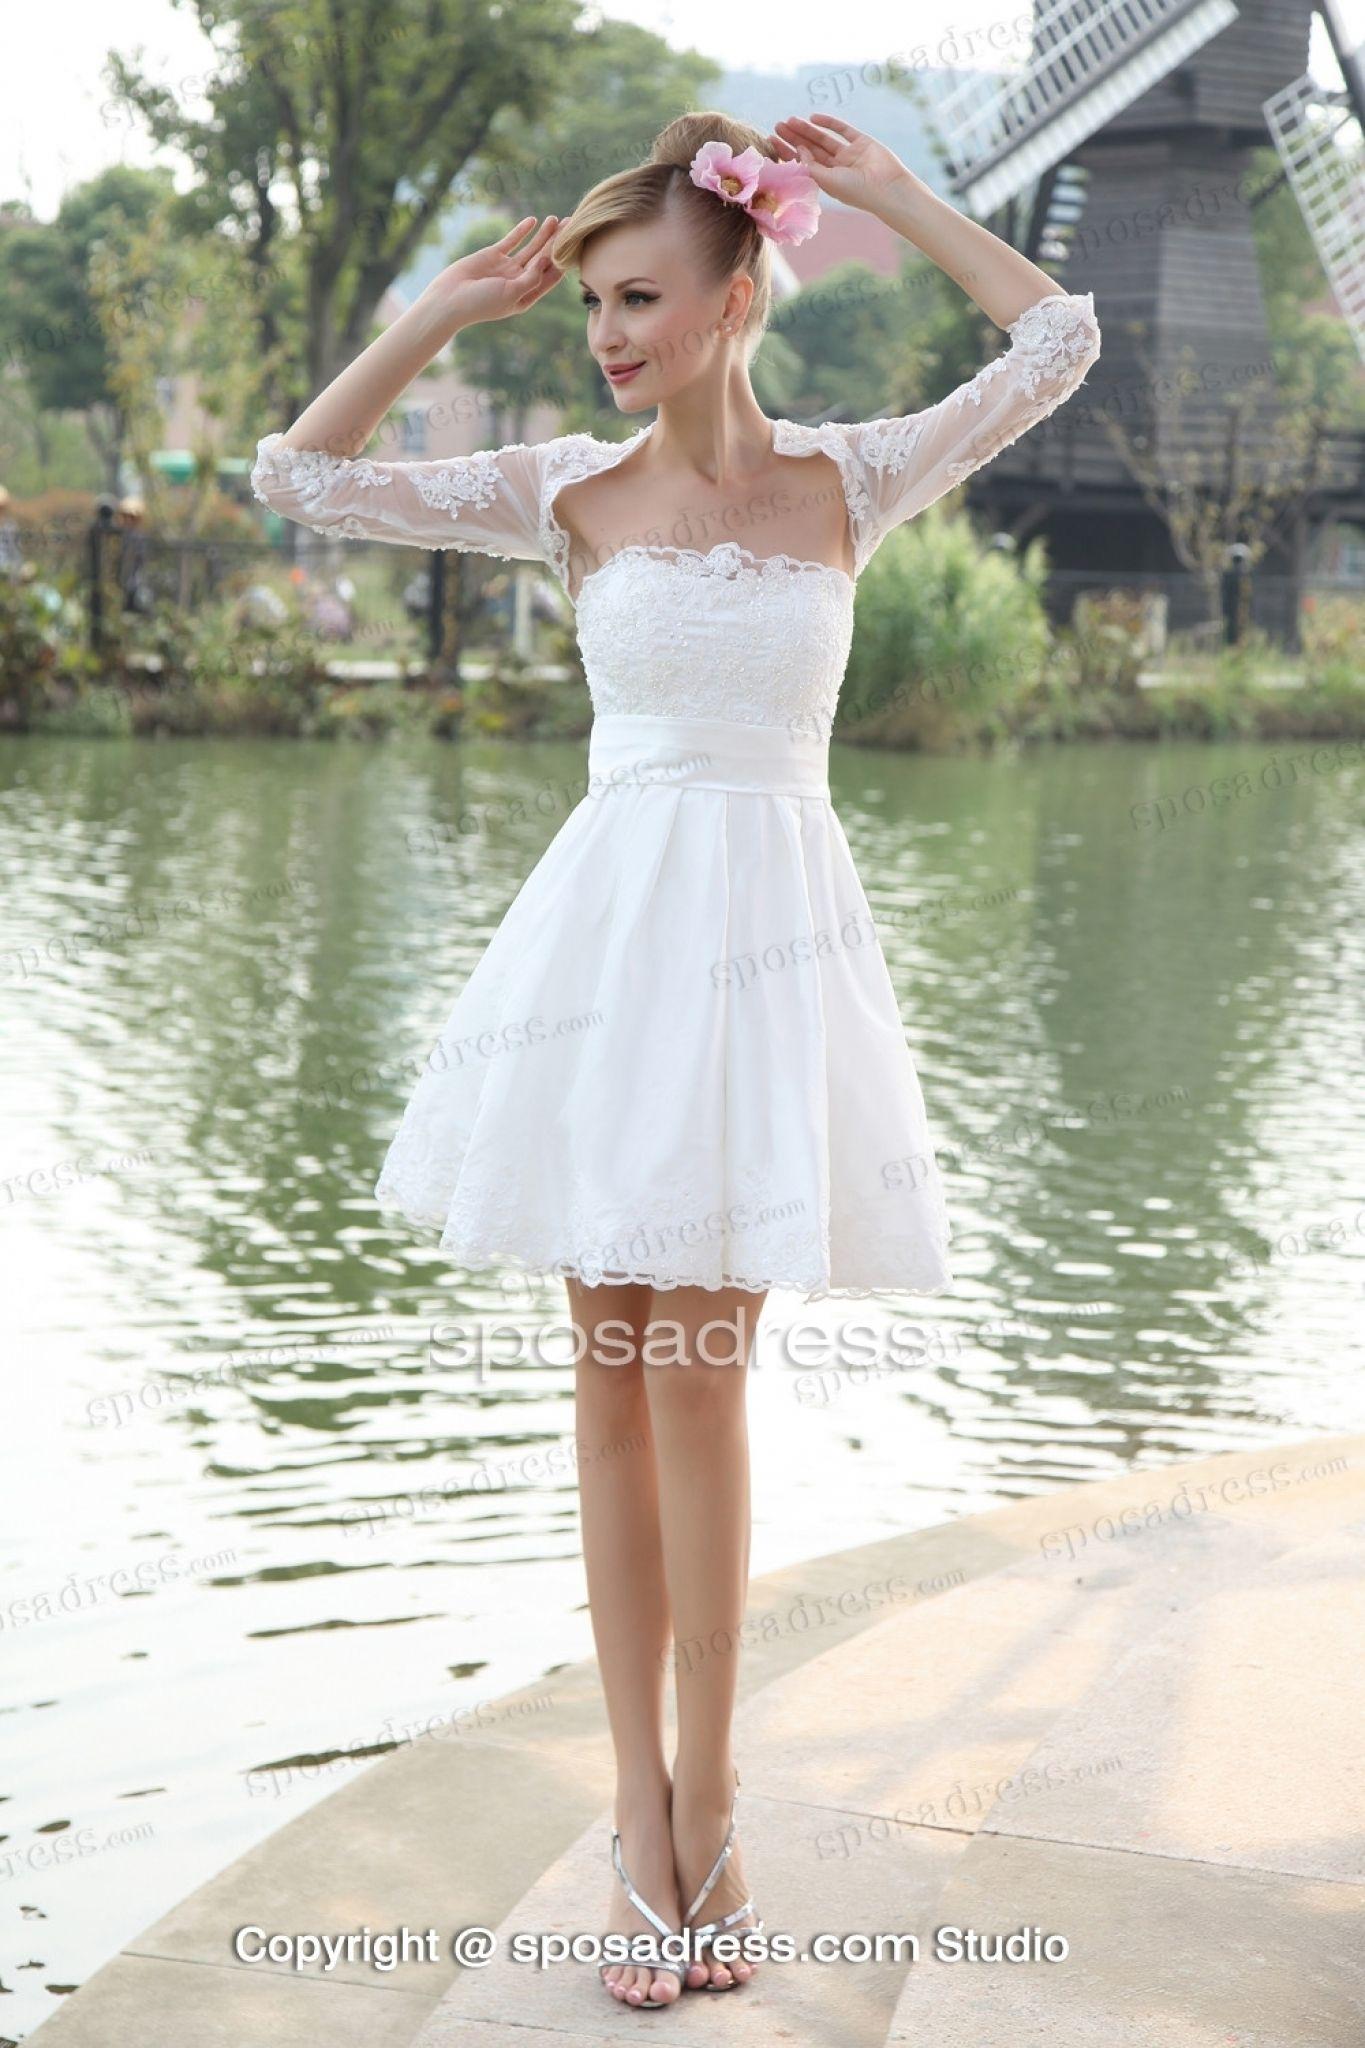 Cute Short Wedding Dresses For Cheap Check More At: Cute Cheap Short Wedding Dresses At Reisefeber.org